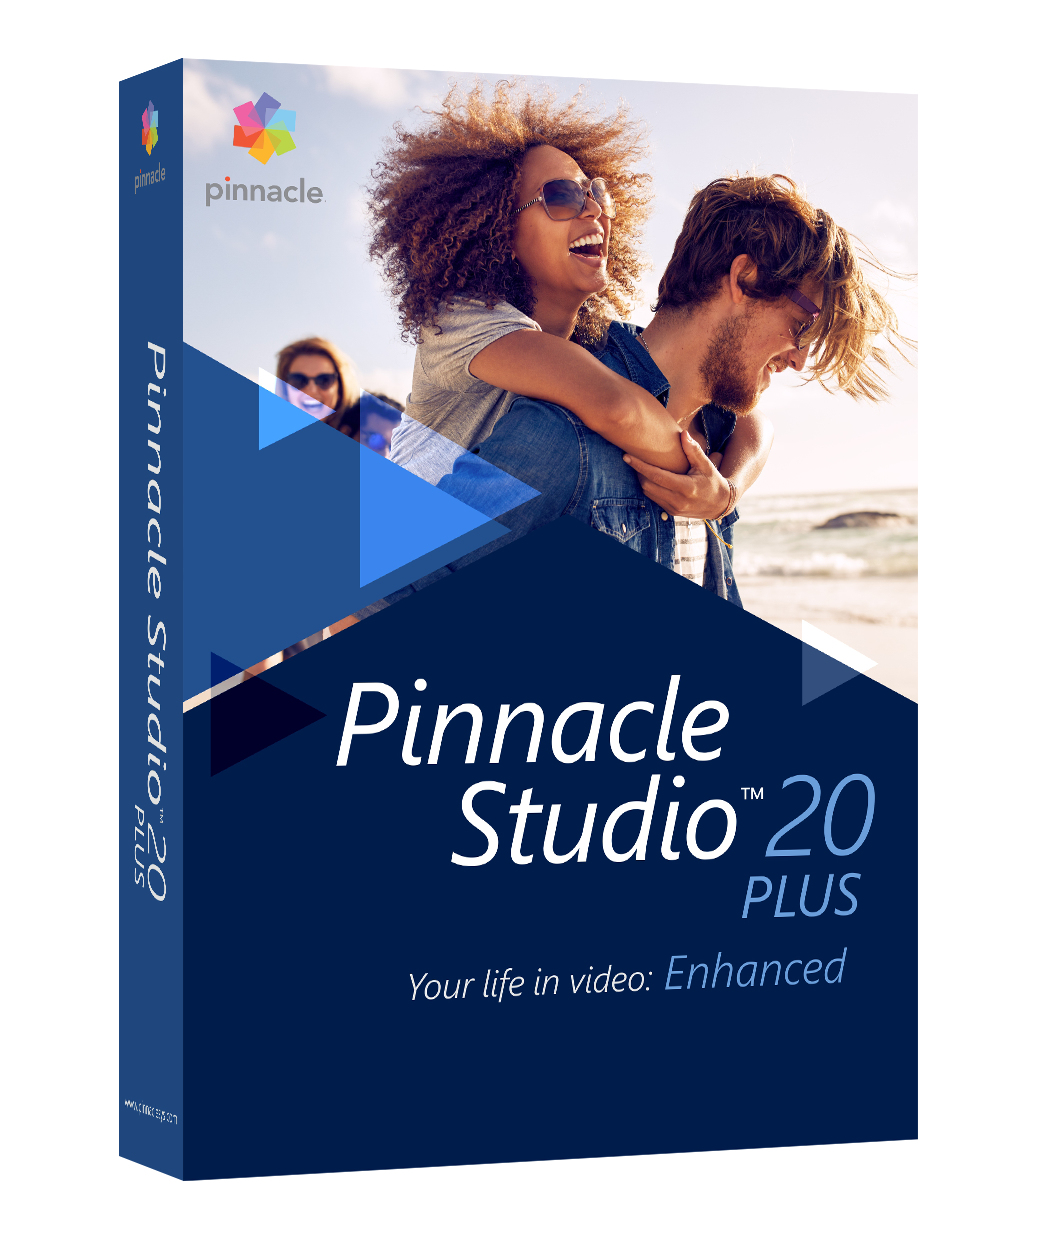 Pinnacle Studio 20 Plus CZ